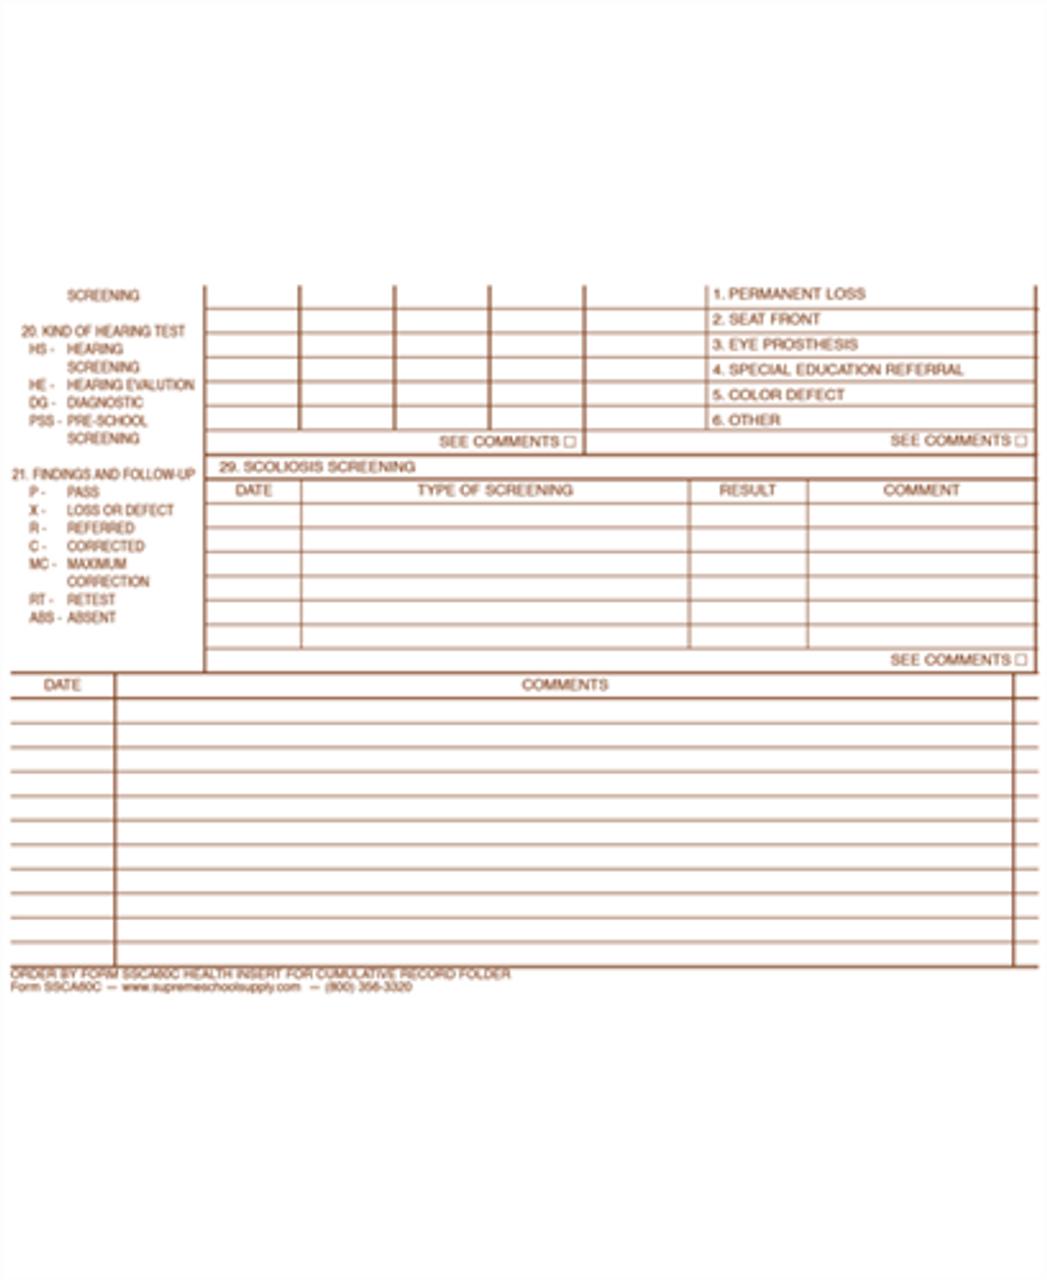 Health Record Insert (SSCA60C)